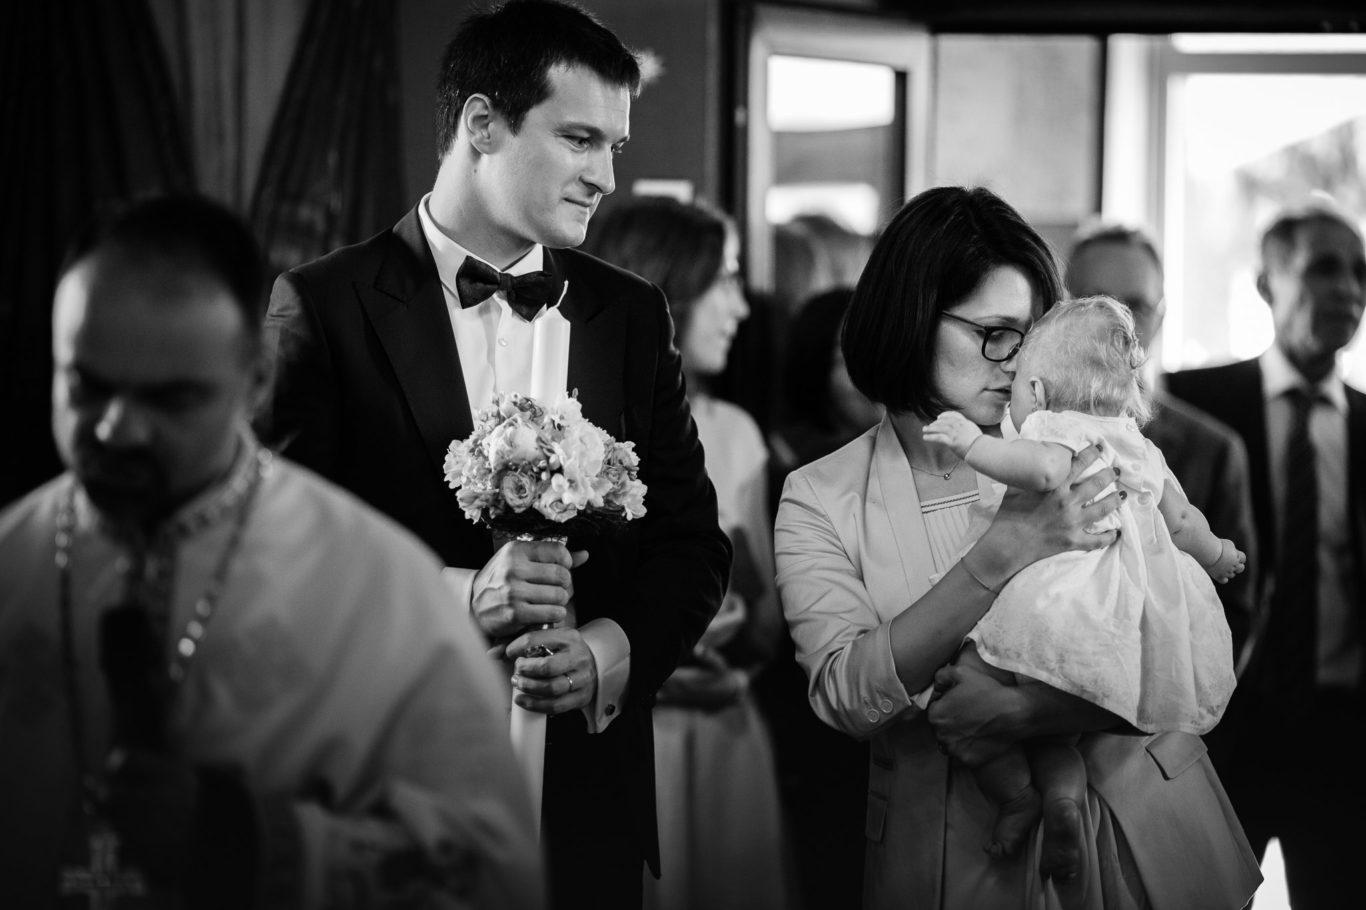 0051-Fotografie-nunta-botez-Ingrid-Geta-Mihai-fotograf-Ciprian-Dumitrescu-IMG_1220